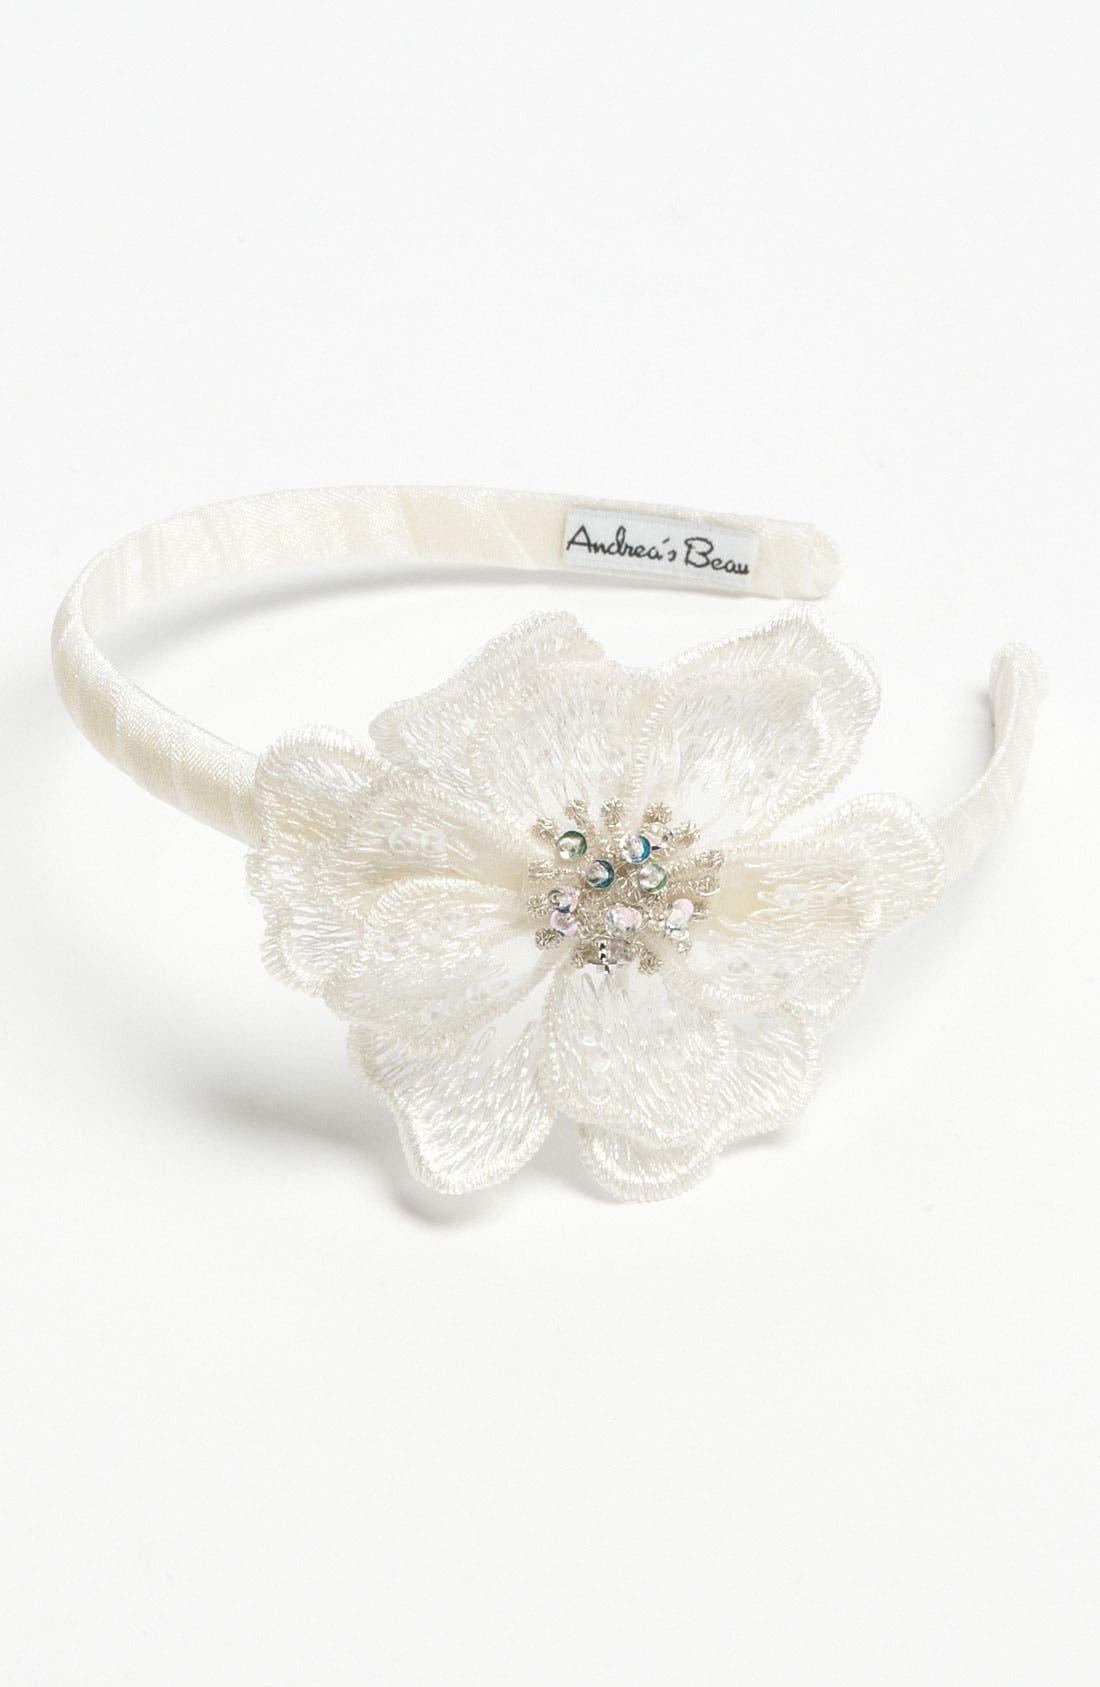 Main Image - Andrea's Beau Flower Headband (Girls)